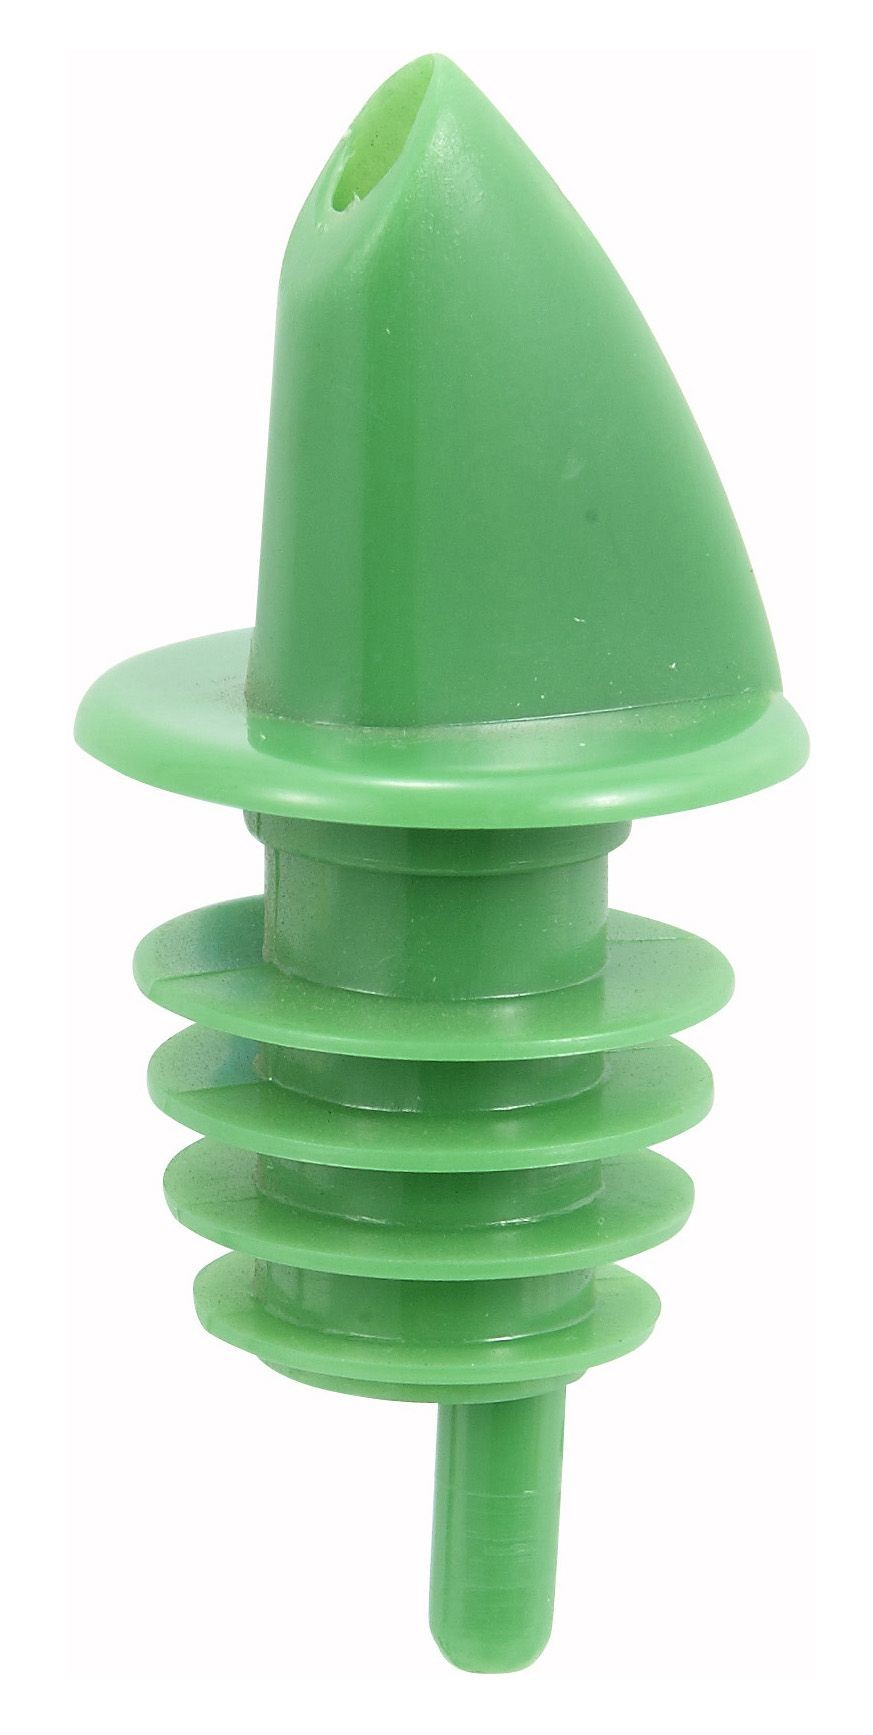 Winco PPR-2G Free Flow Pourer, Green